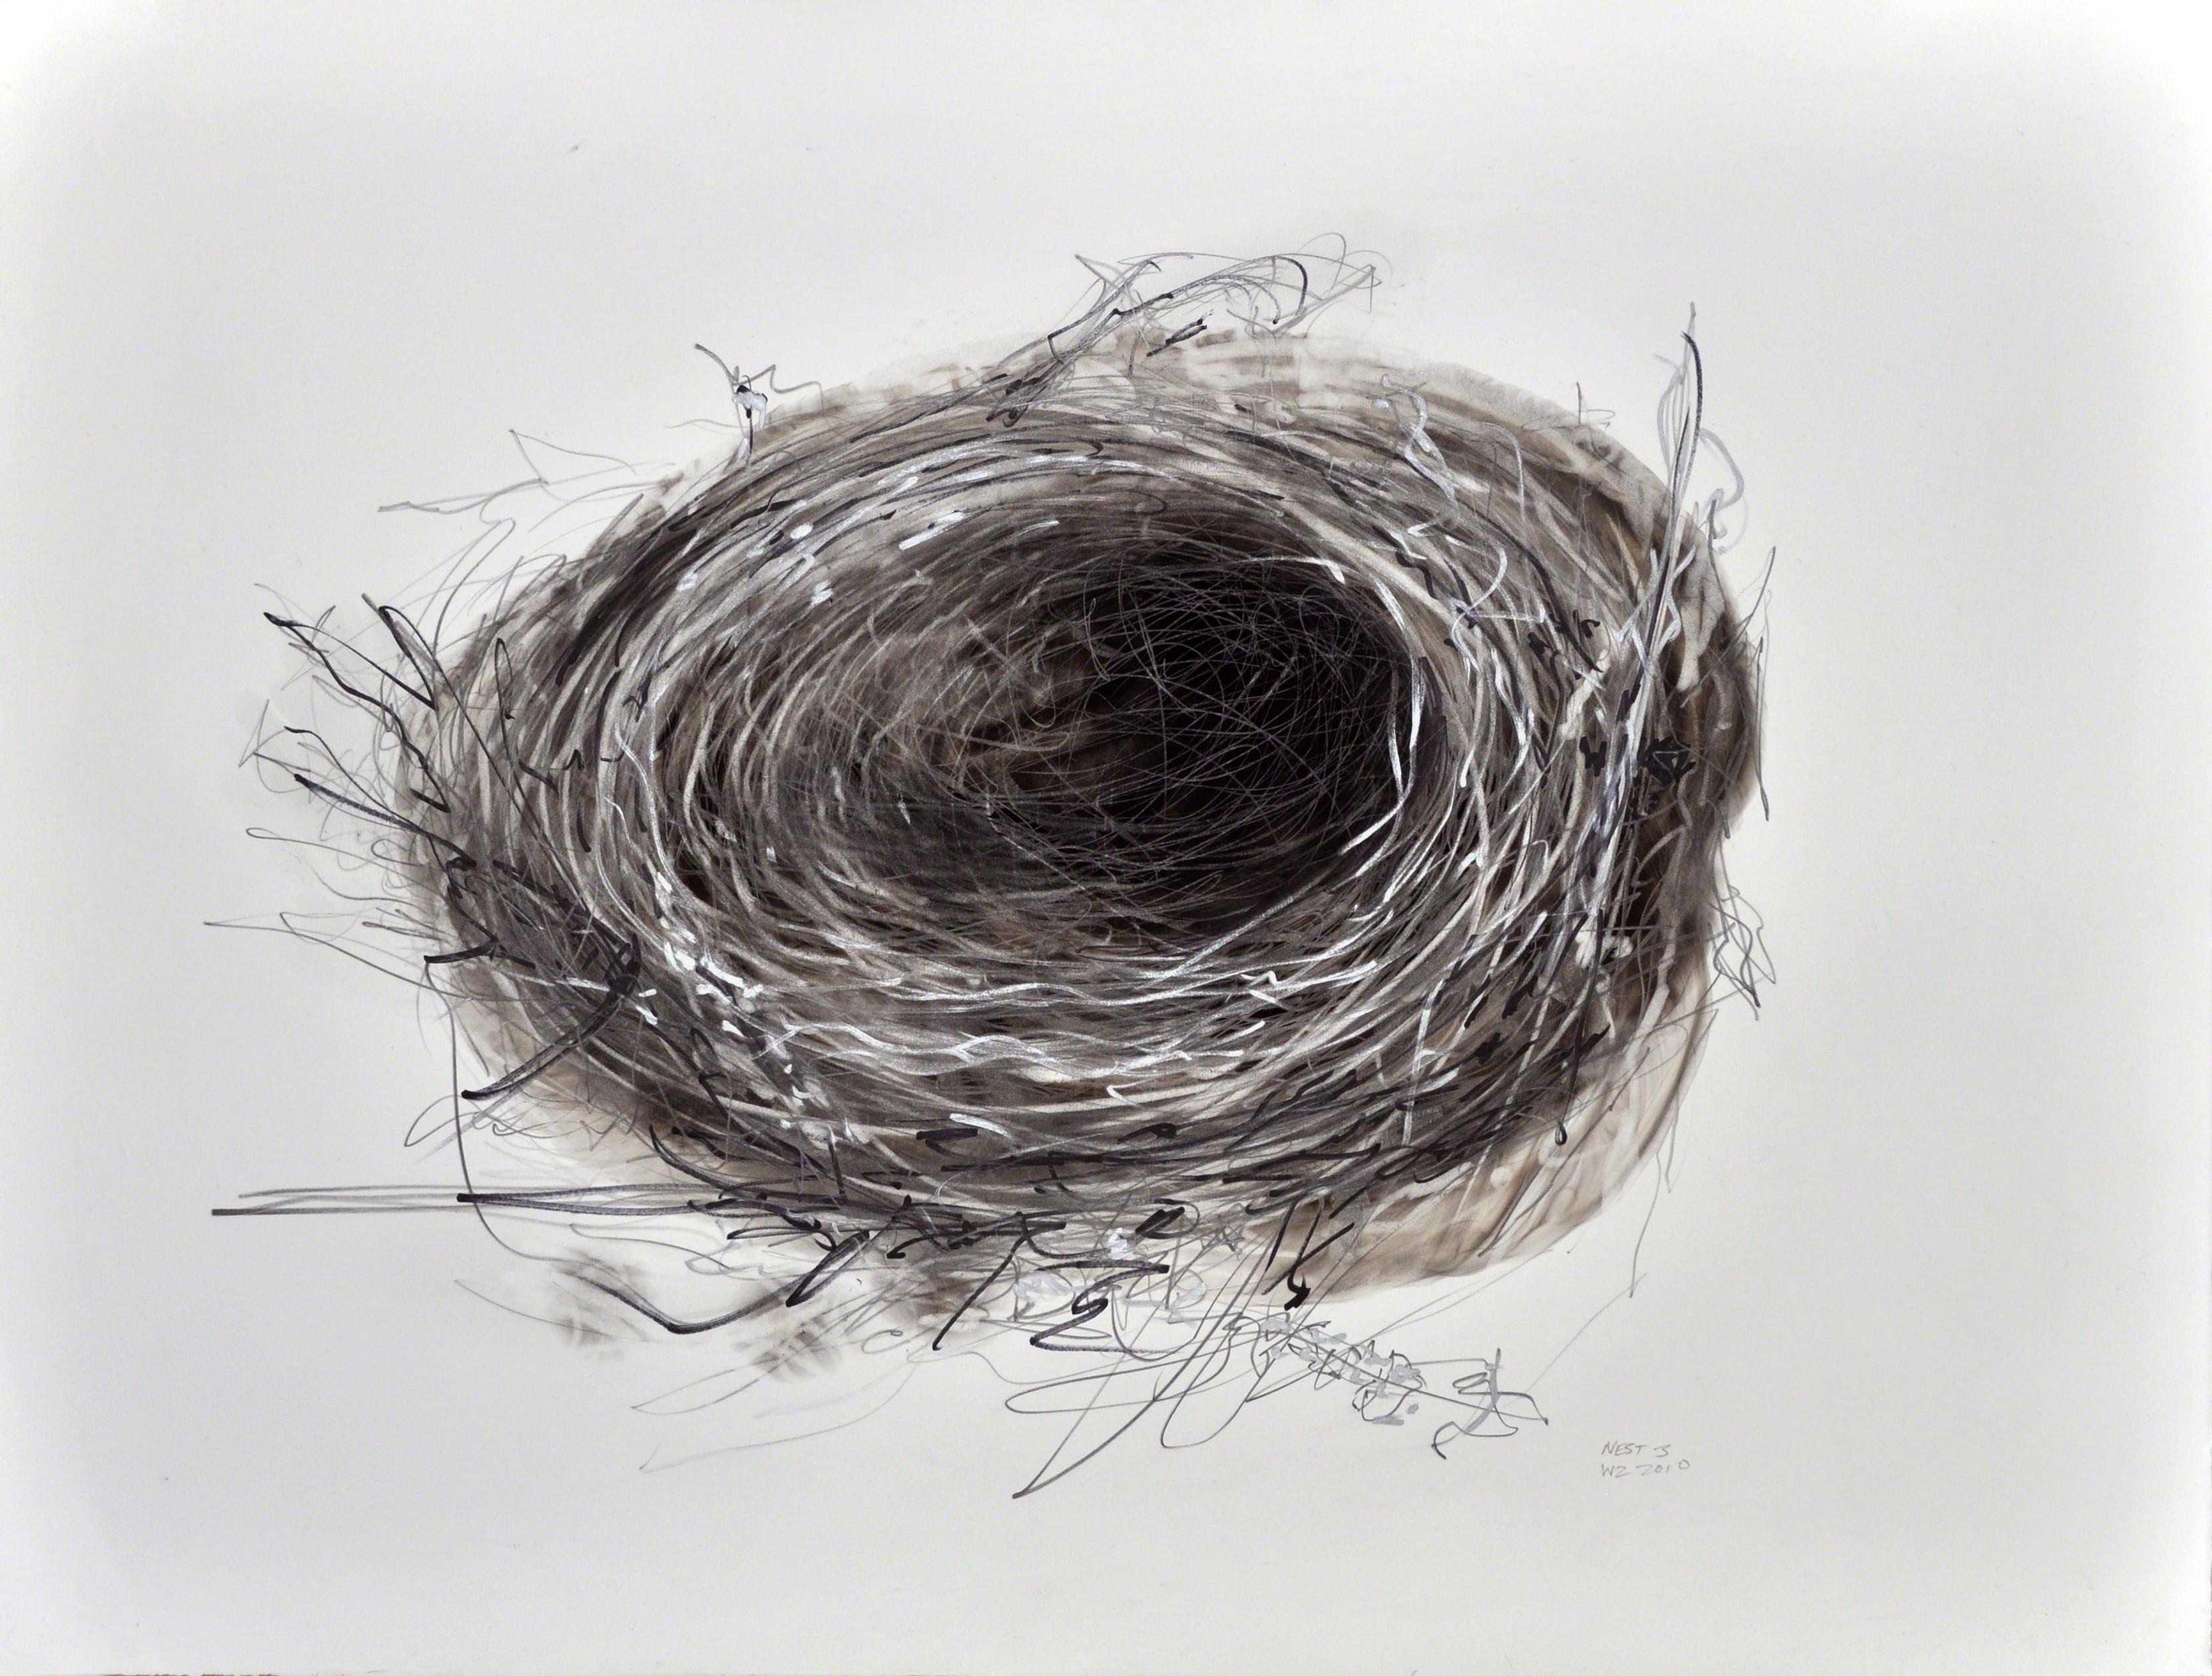 , 'Nest,' 2010, Elisa Contemporary